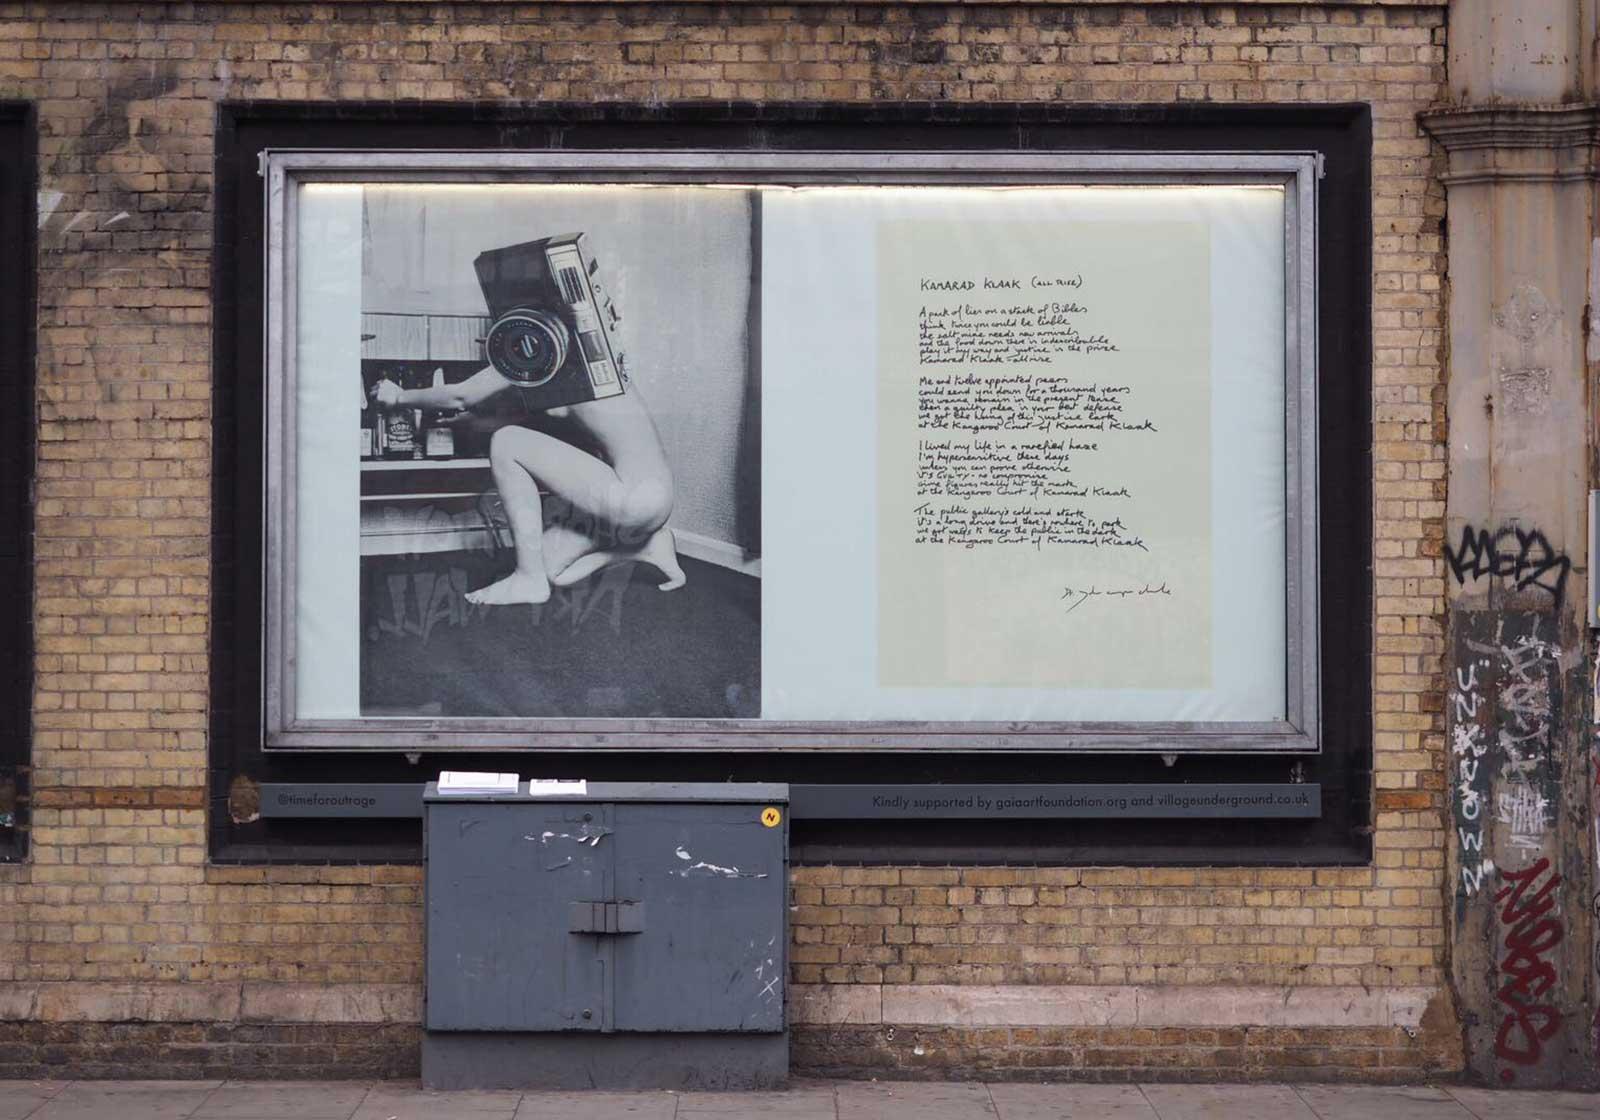 Linder's composite photograph and John Cooper Clarke's Kamarad Klaak